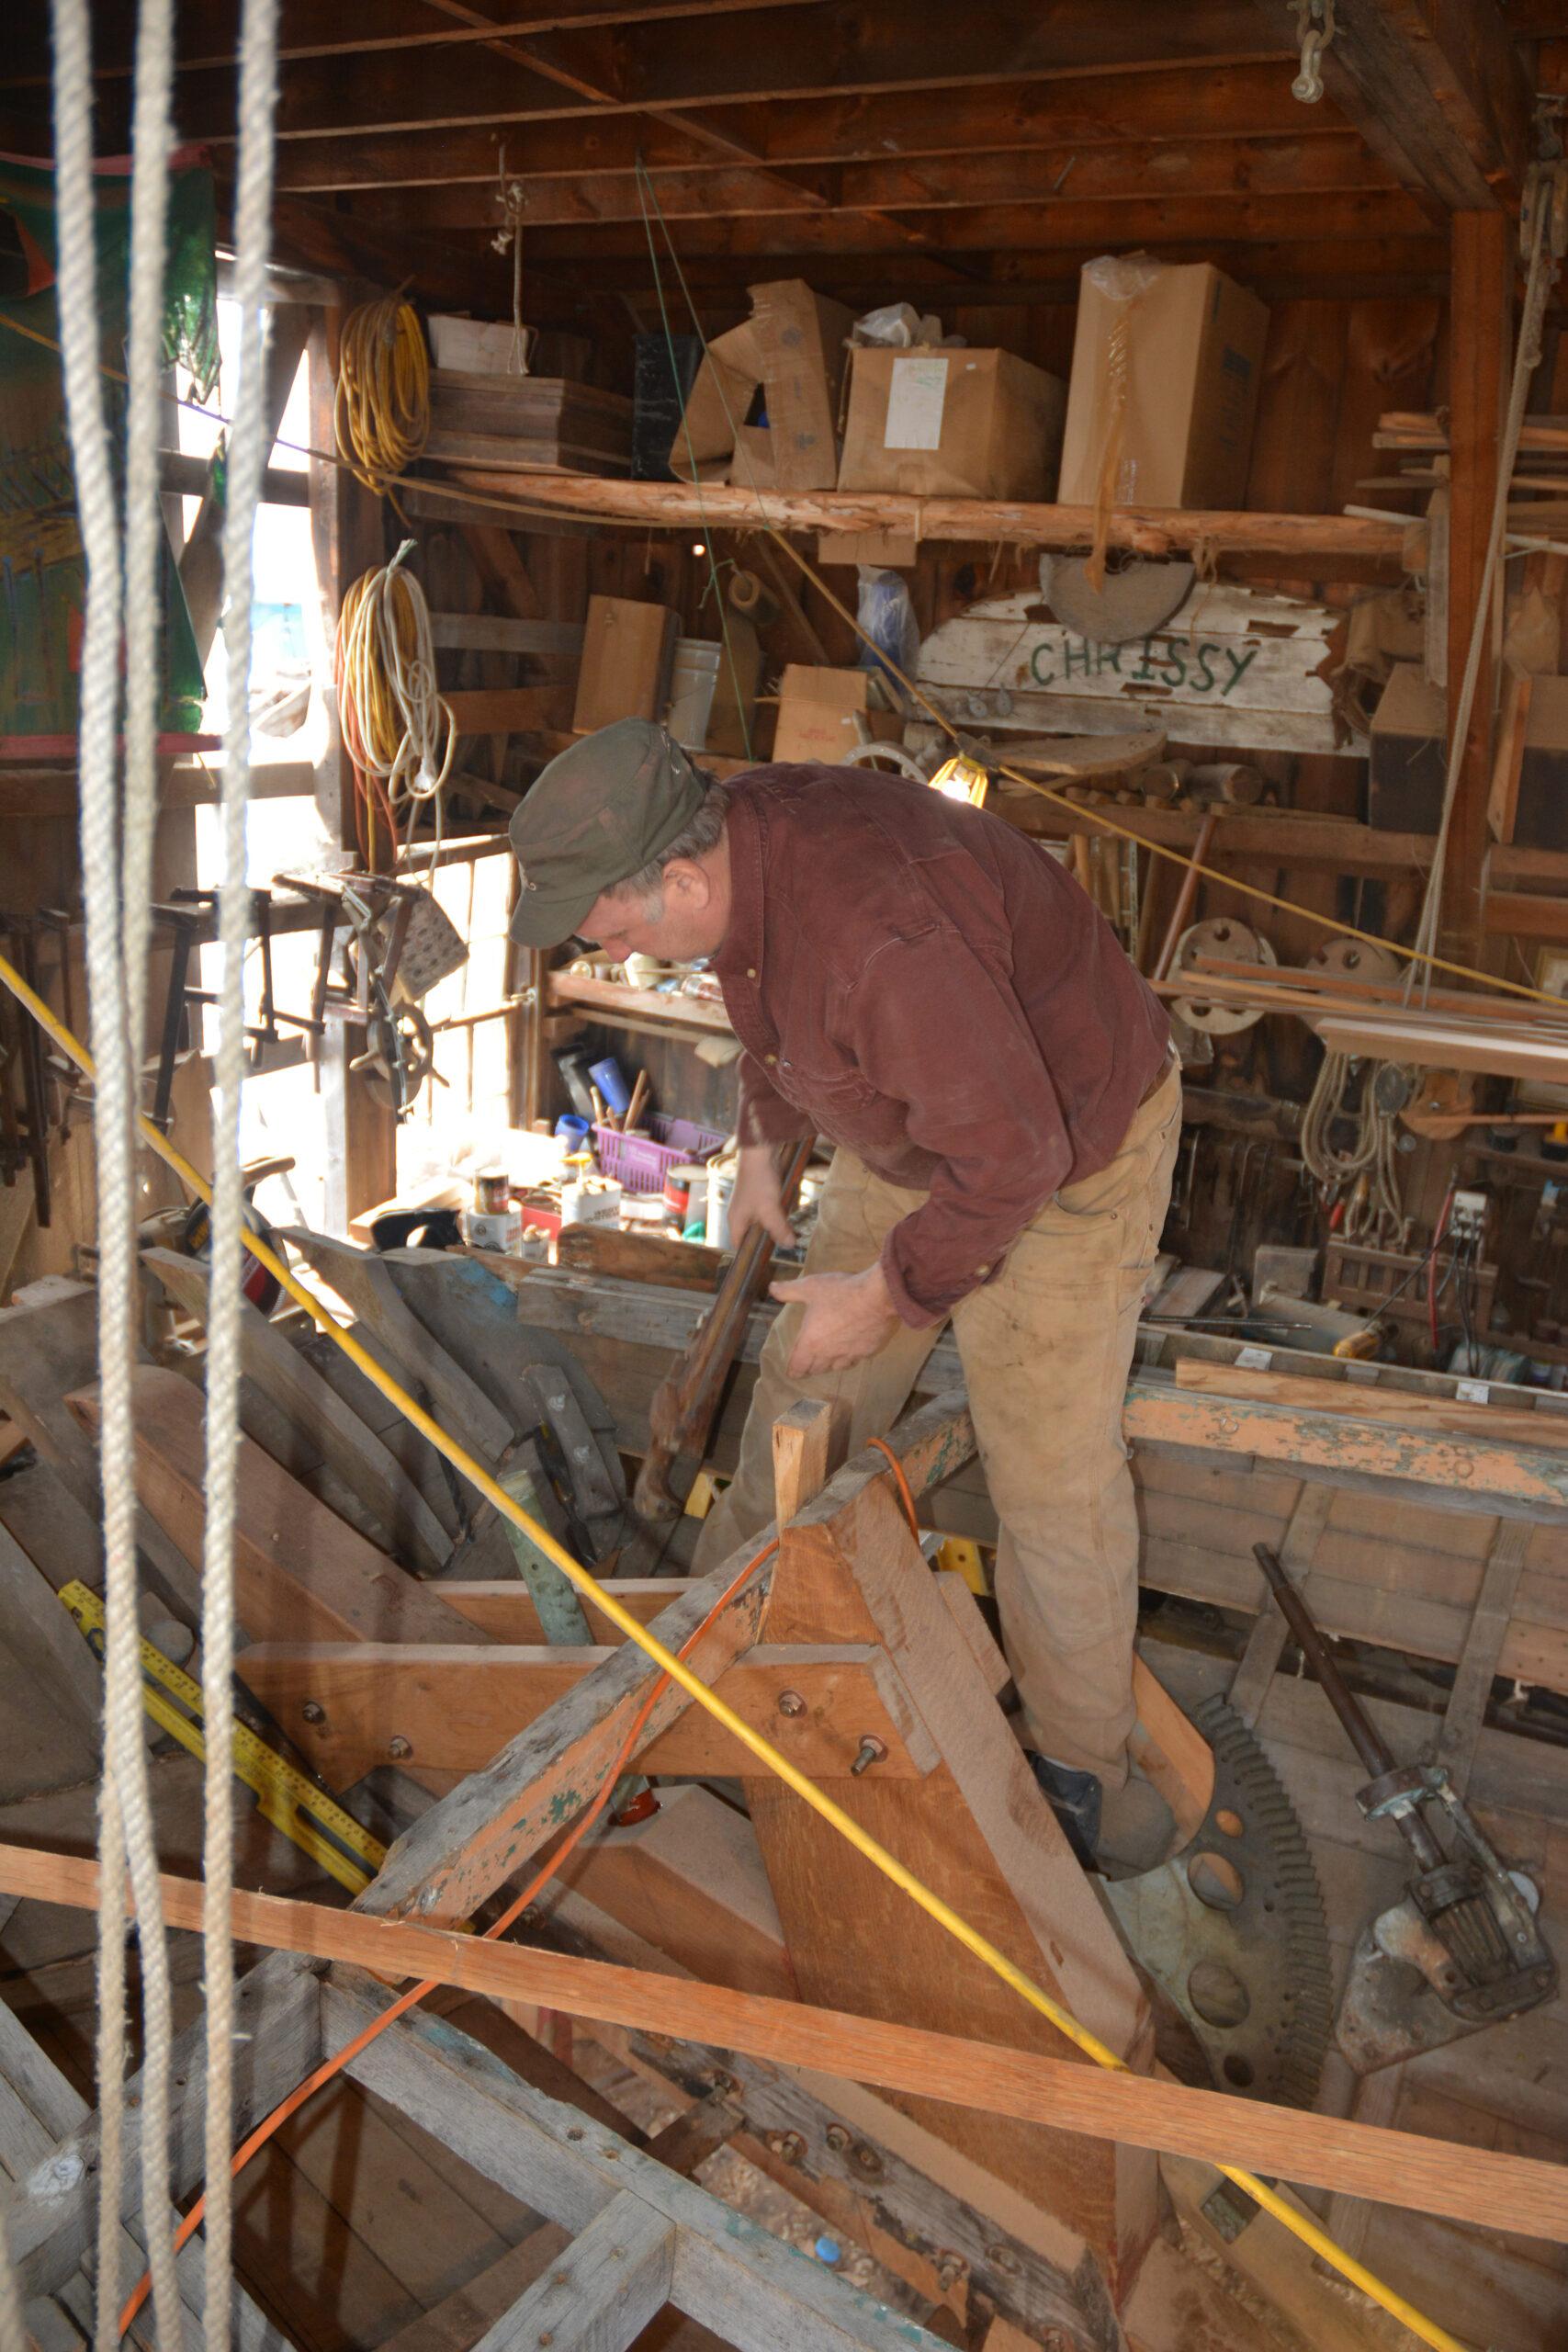 Harold climbing inside Maria carrying a wrench.